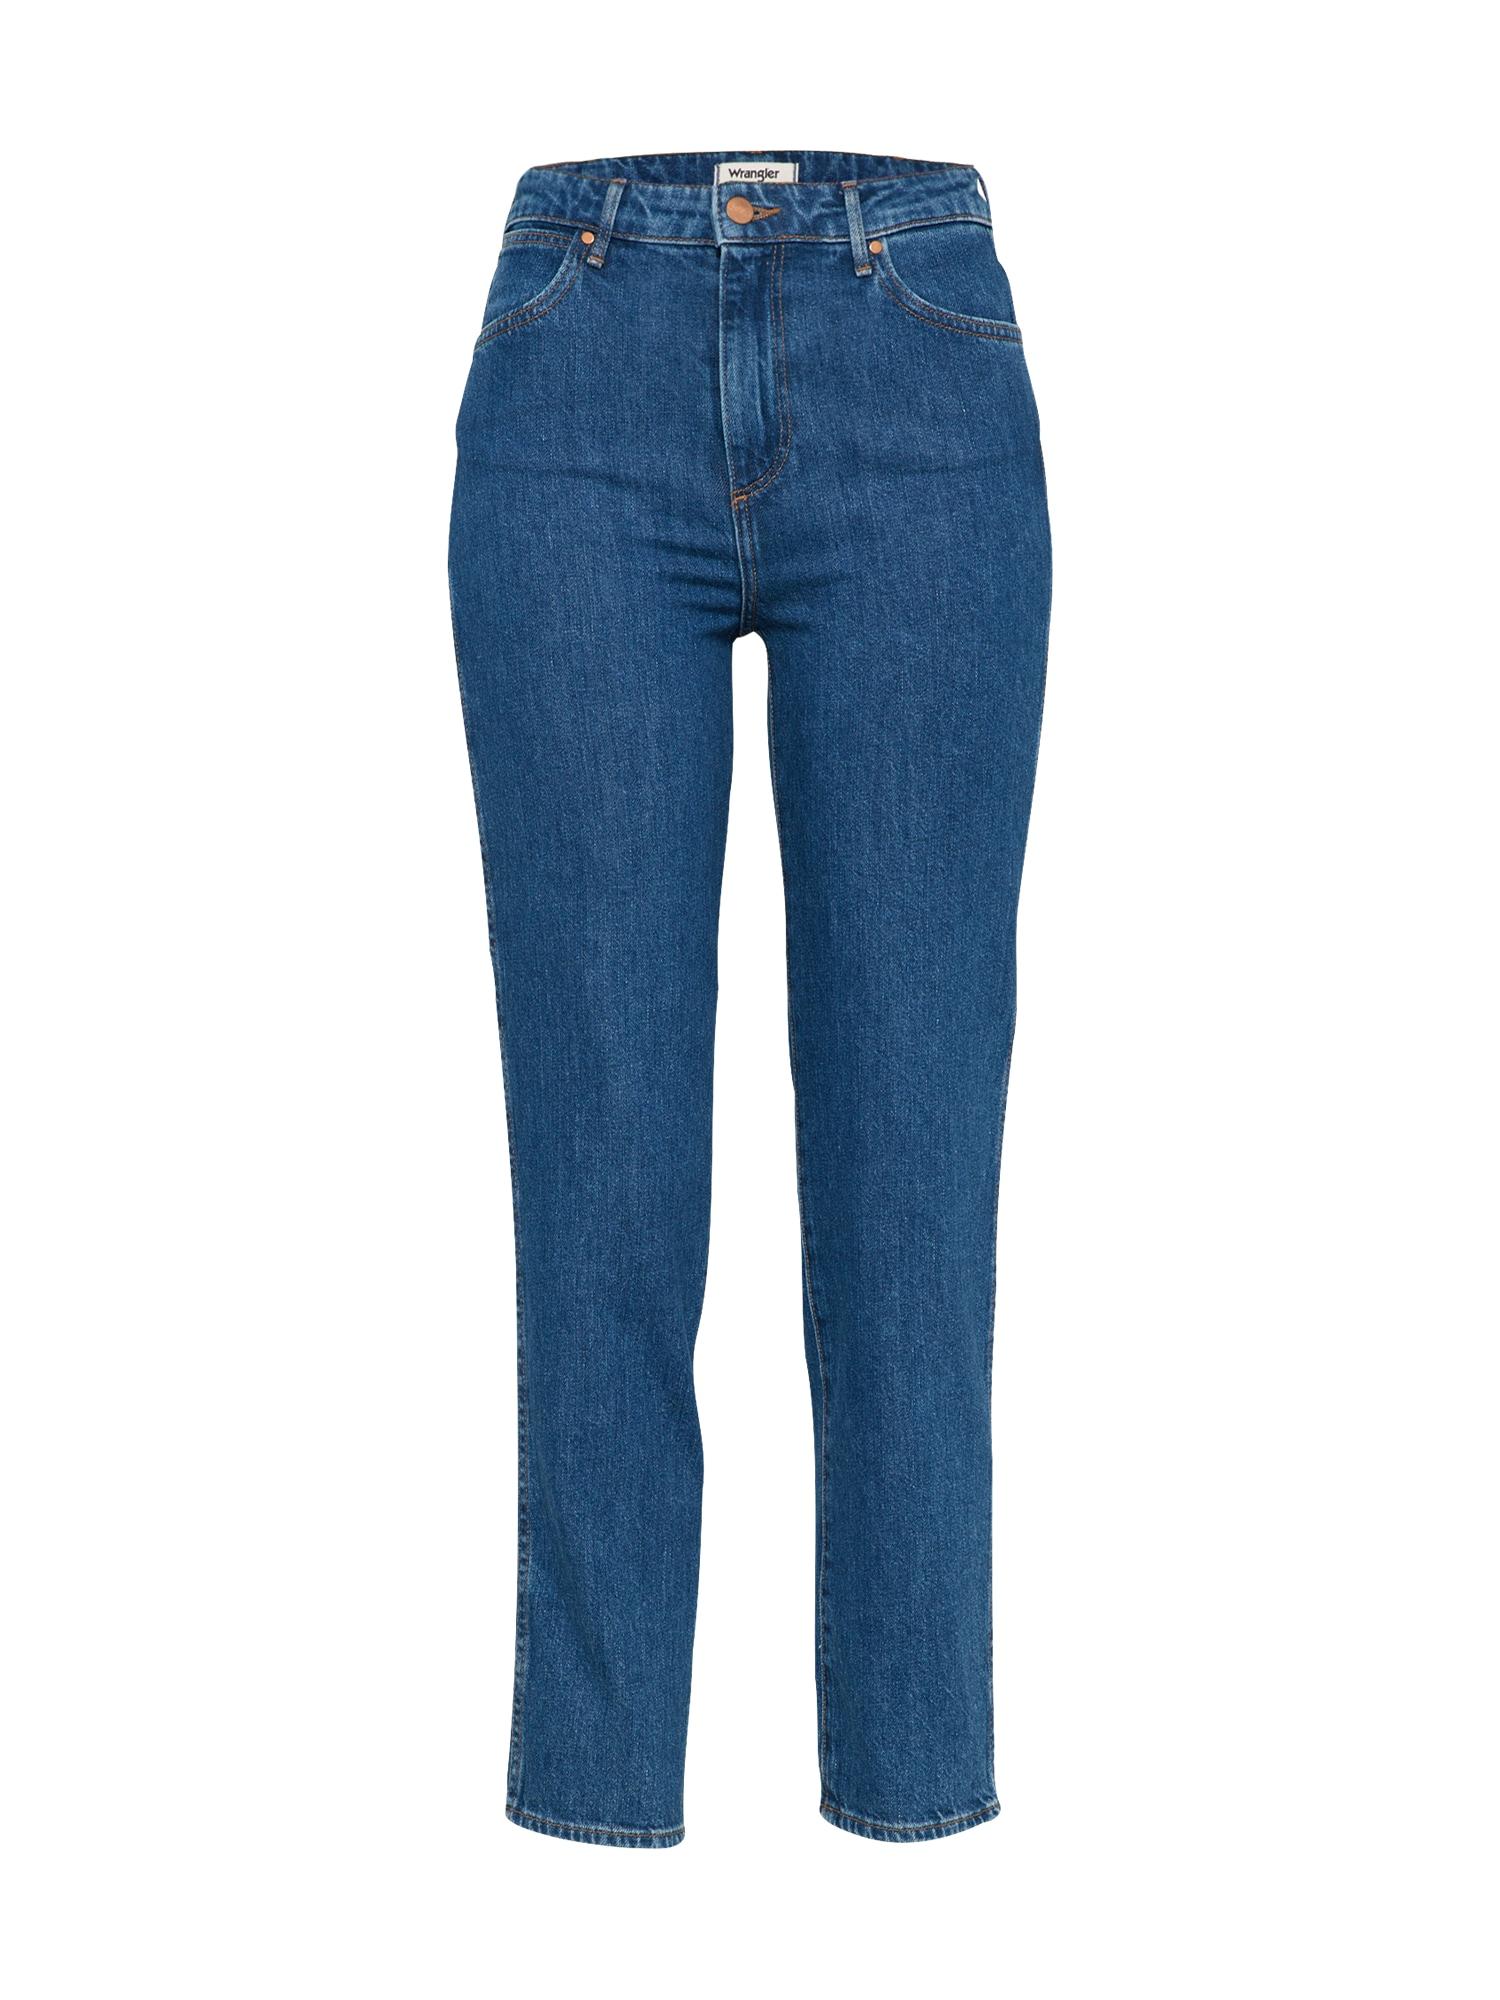 WRANGLER Dames Jeans Retro Slim blauw